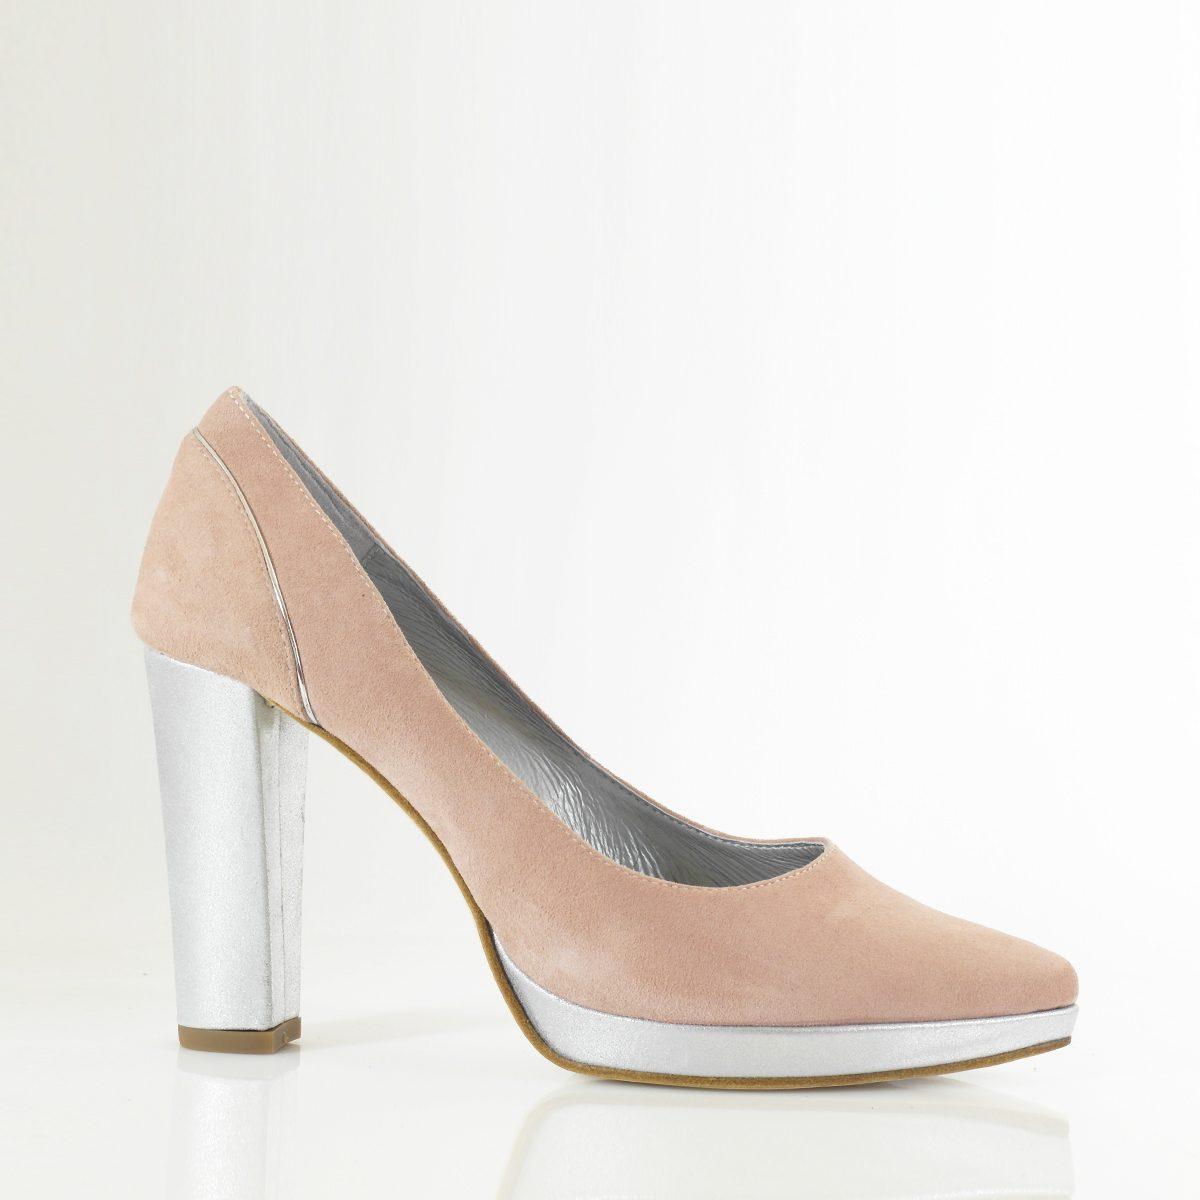 SALON MOD.1833 (10cm) - Zapatos personalizados fiesta